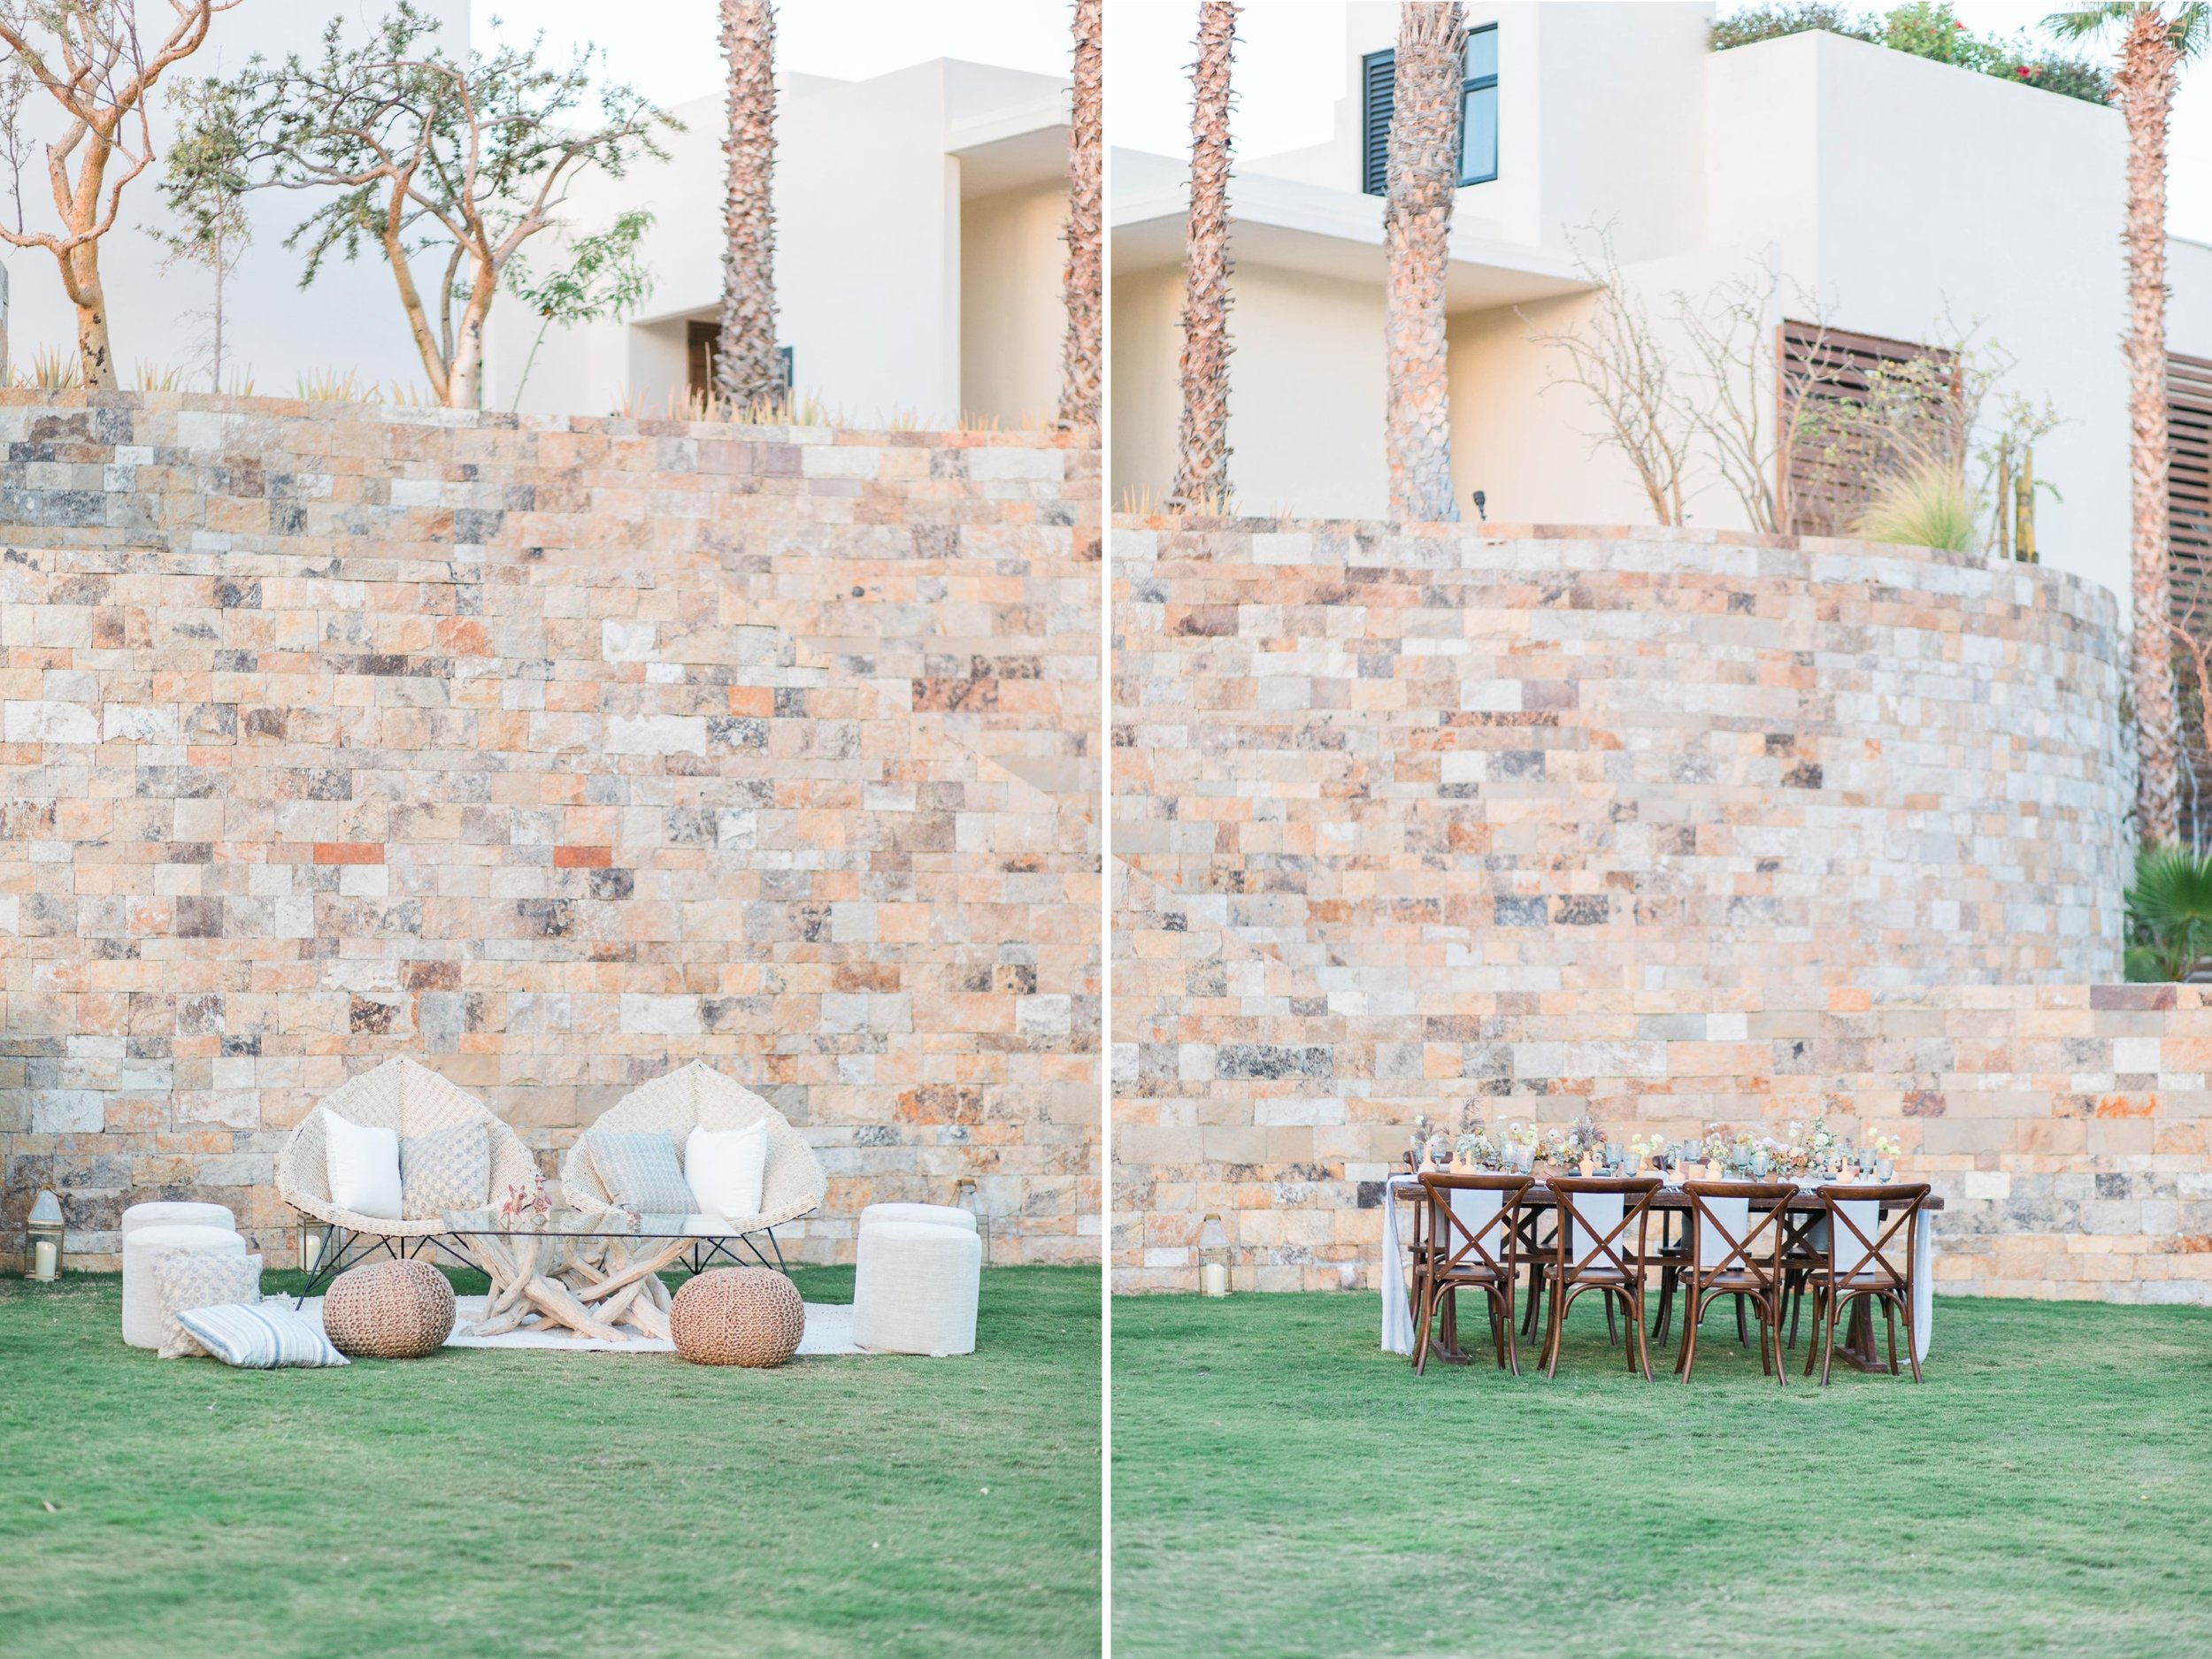 Los Cabos Wedding Photographer - Destination Wedding - Chileno Bay Resort Wedding Photos (18).jpg